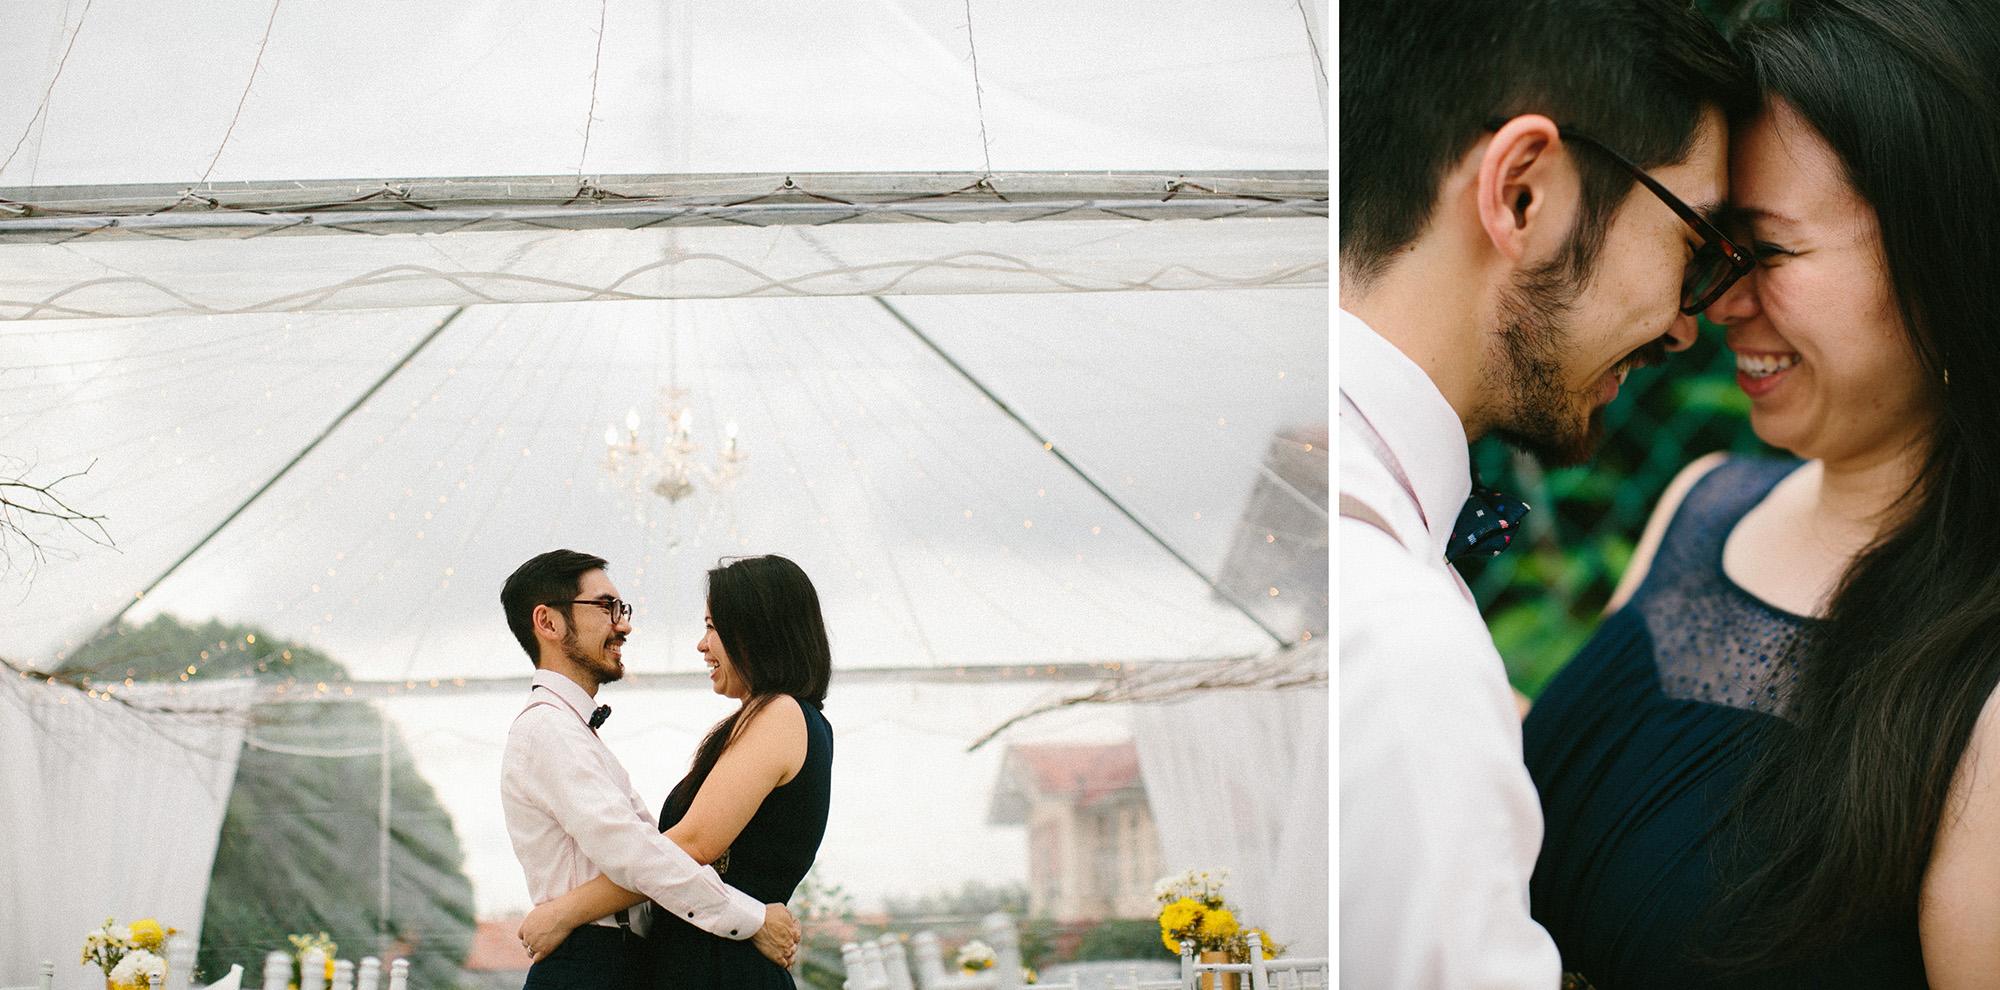 81-hellojanelee-sam grace-malaysia-wedding-day